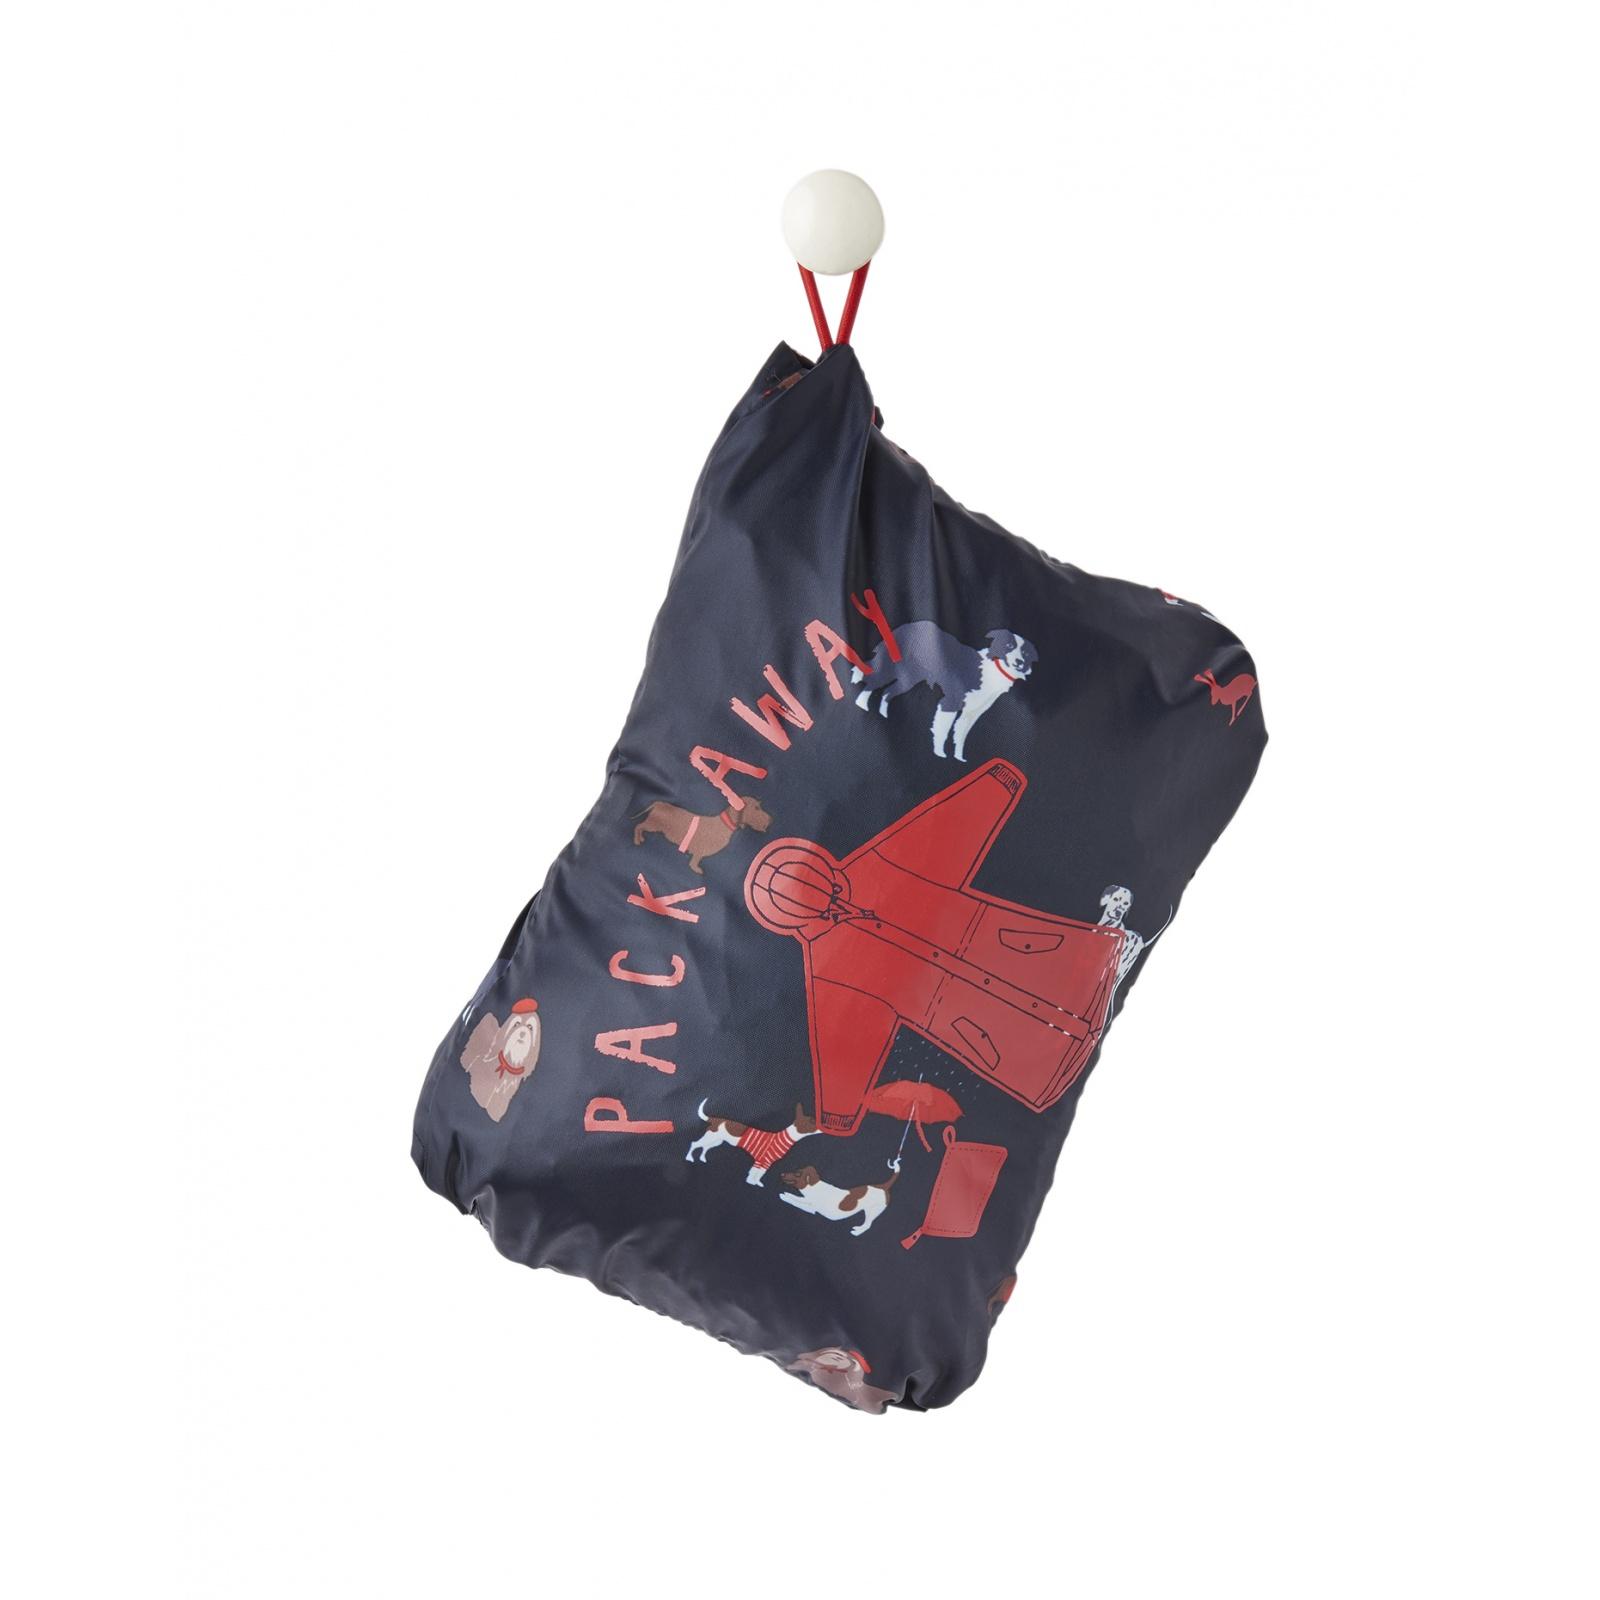 Joules-Golightly-Packaway-Waterproof-Jacket-SS19 miniature 15